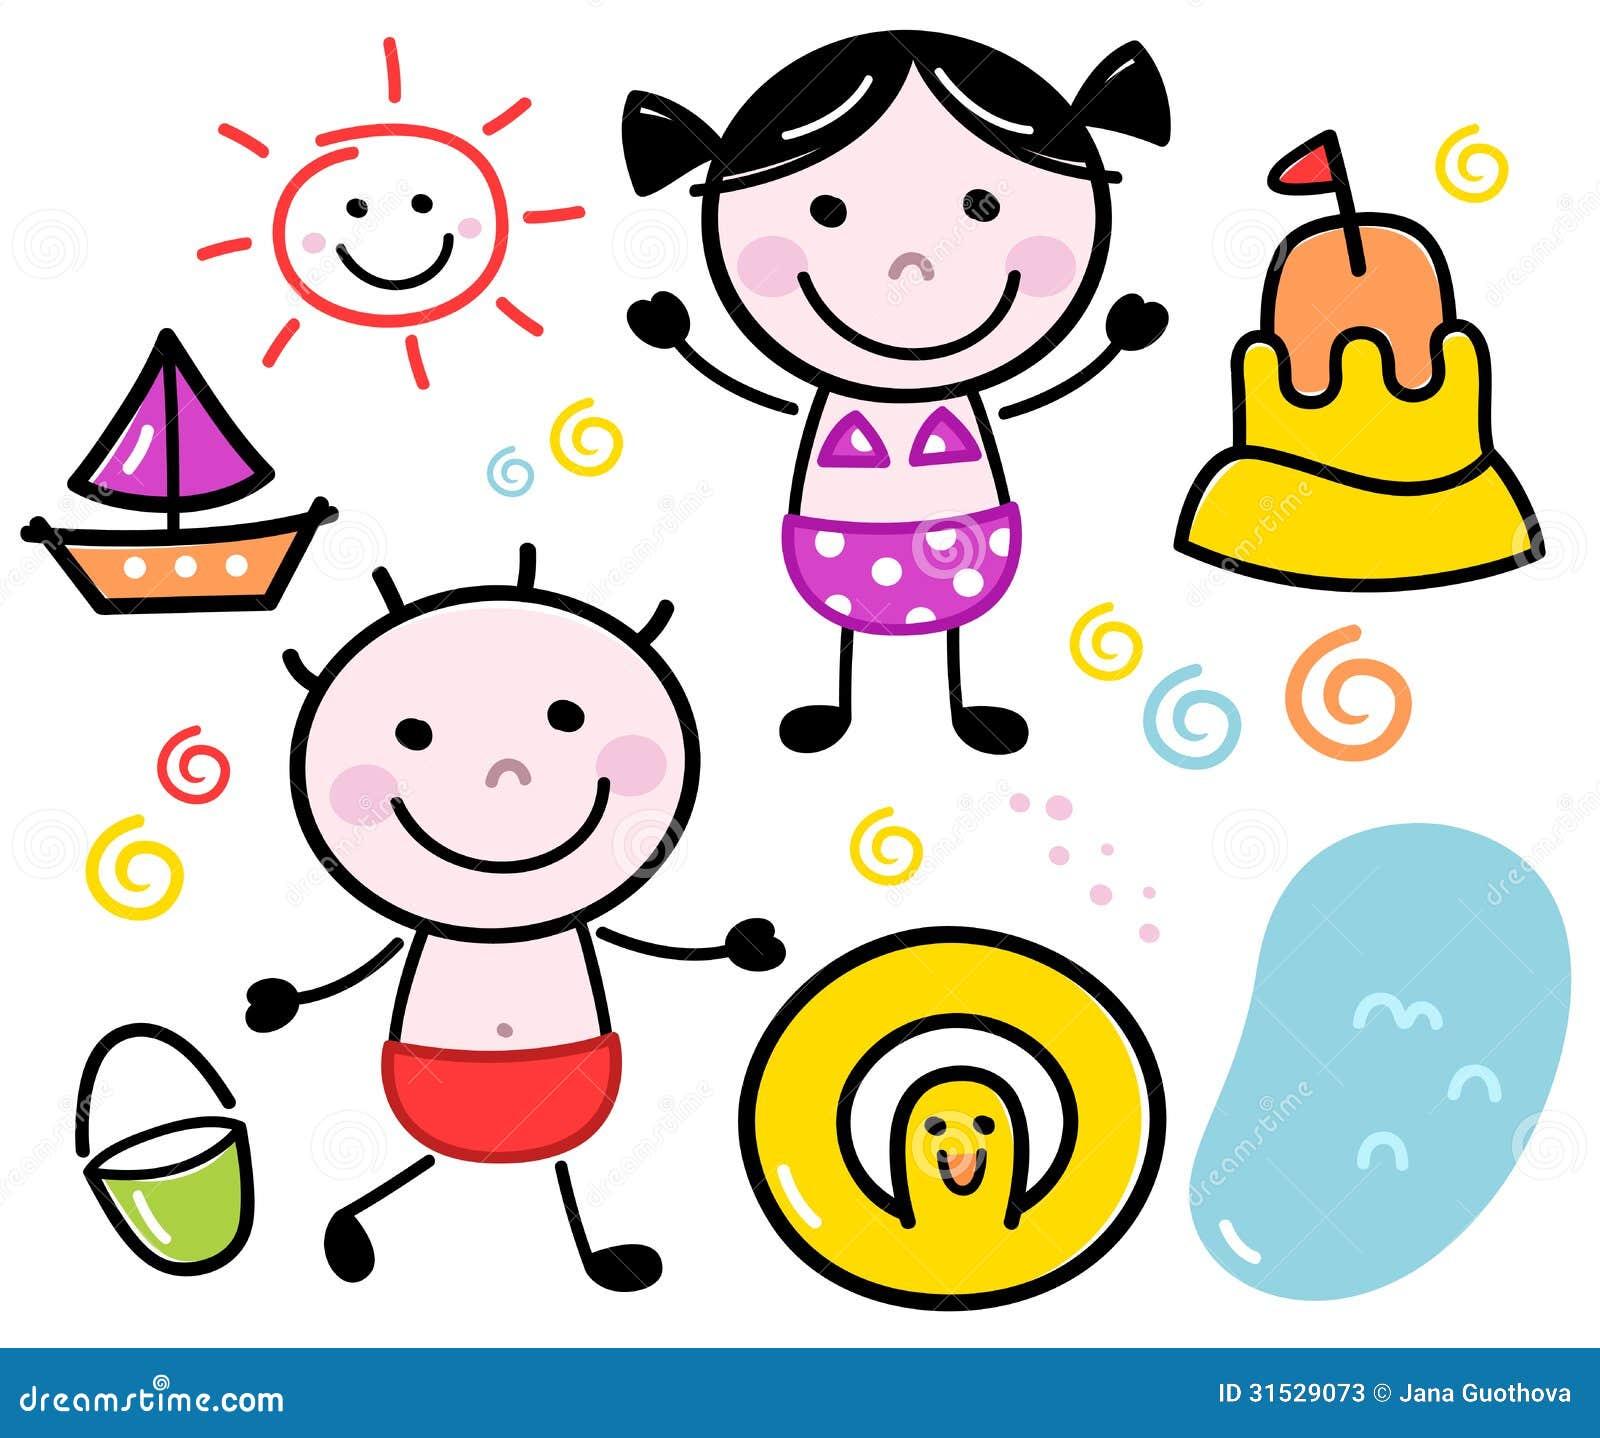 Stock Photos: Cute summer doodle kids set. Image: 31529073